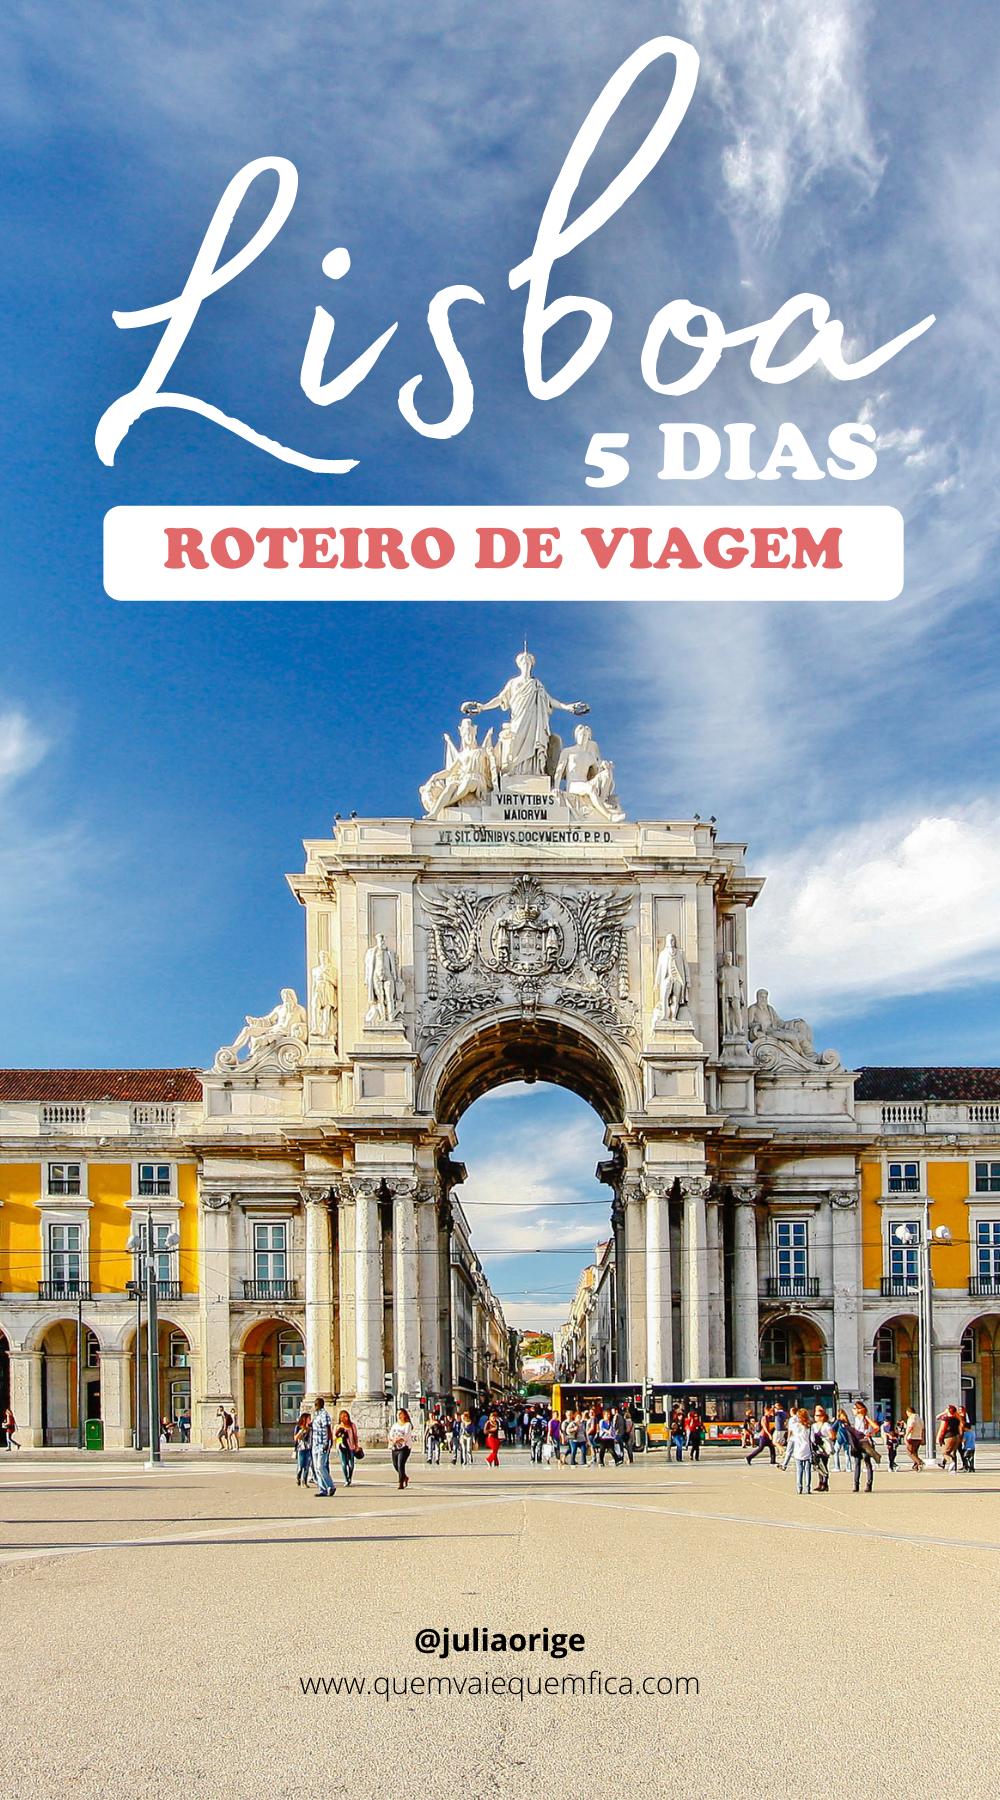 Roteiro de Lisboa: o que fazer na capital portuguesa